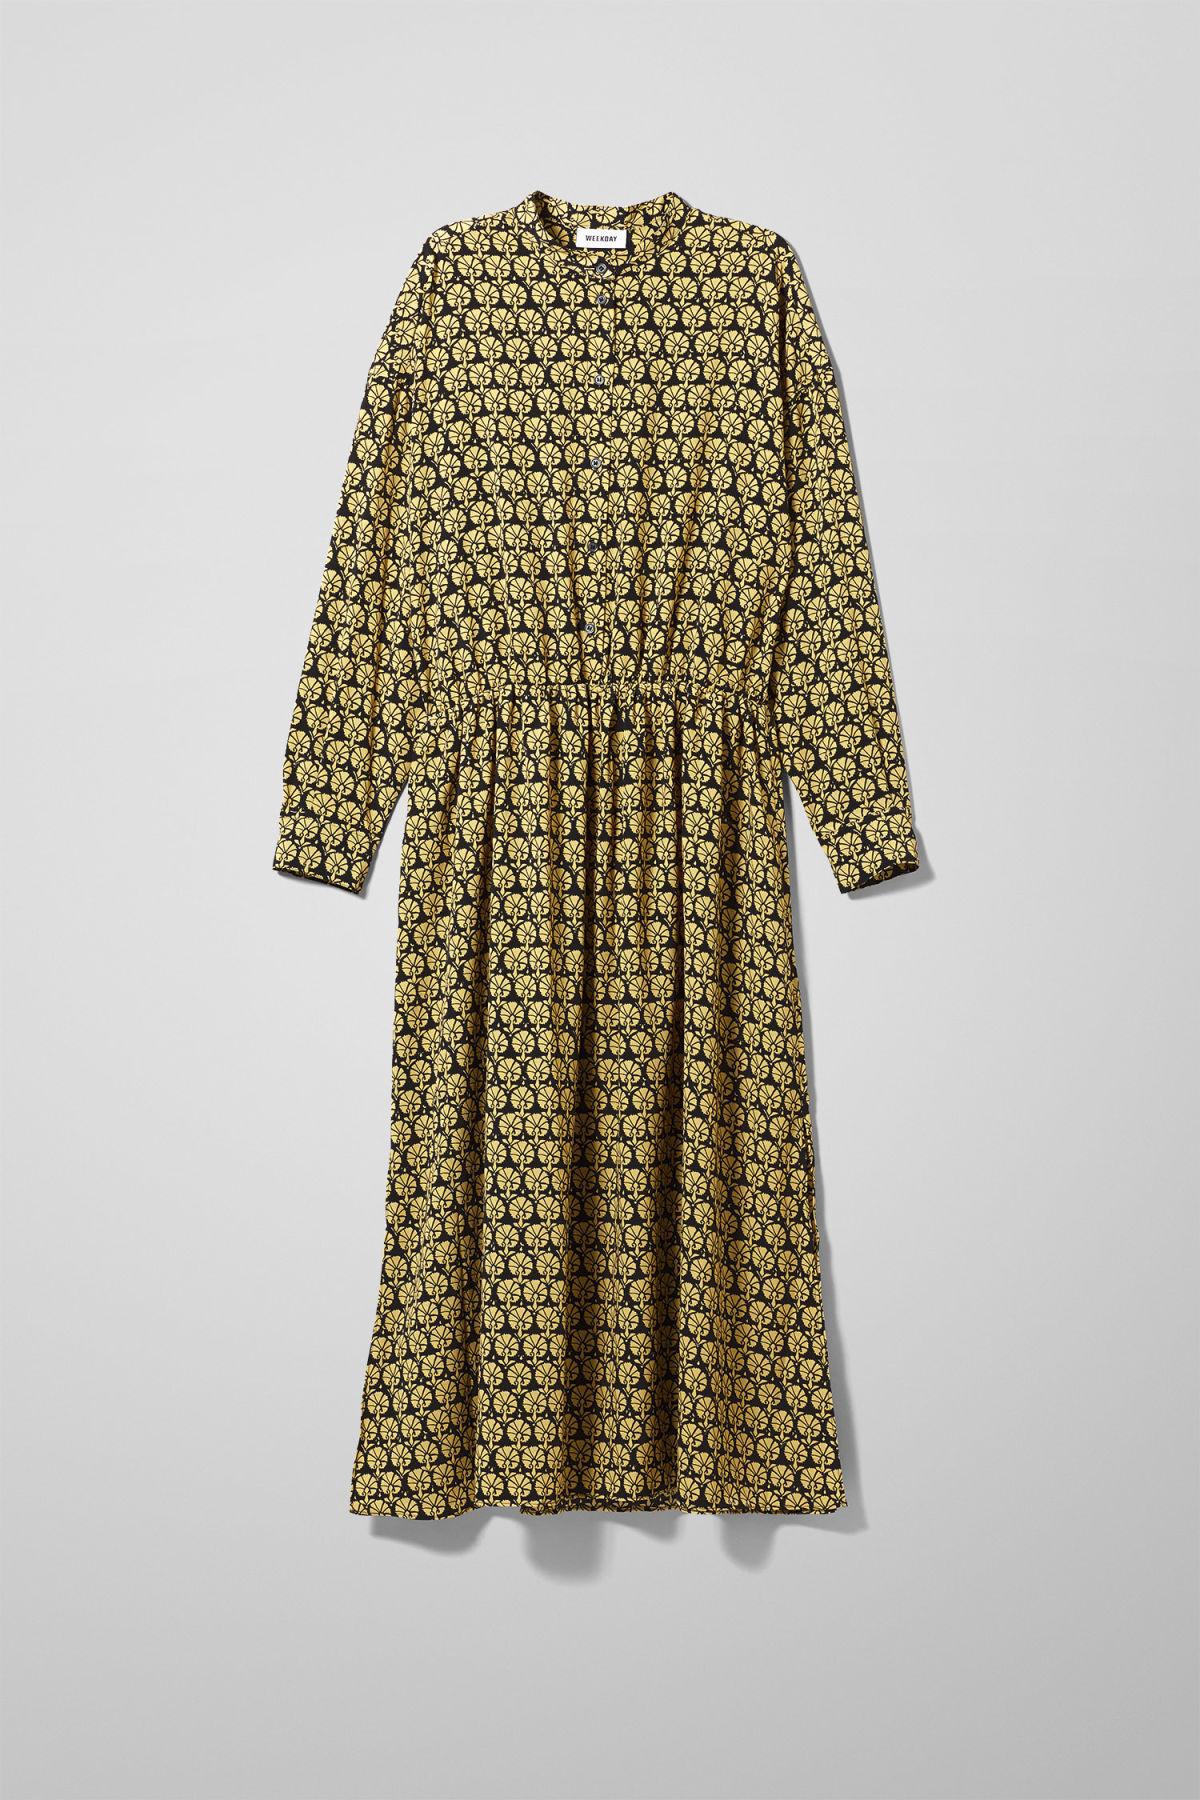 Image of Trudy Dress - Yellow-M